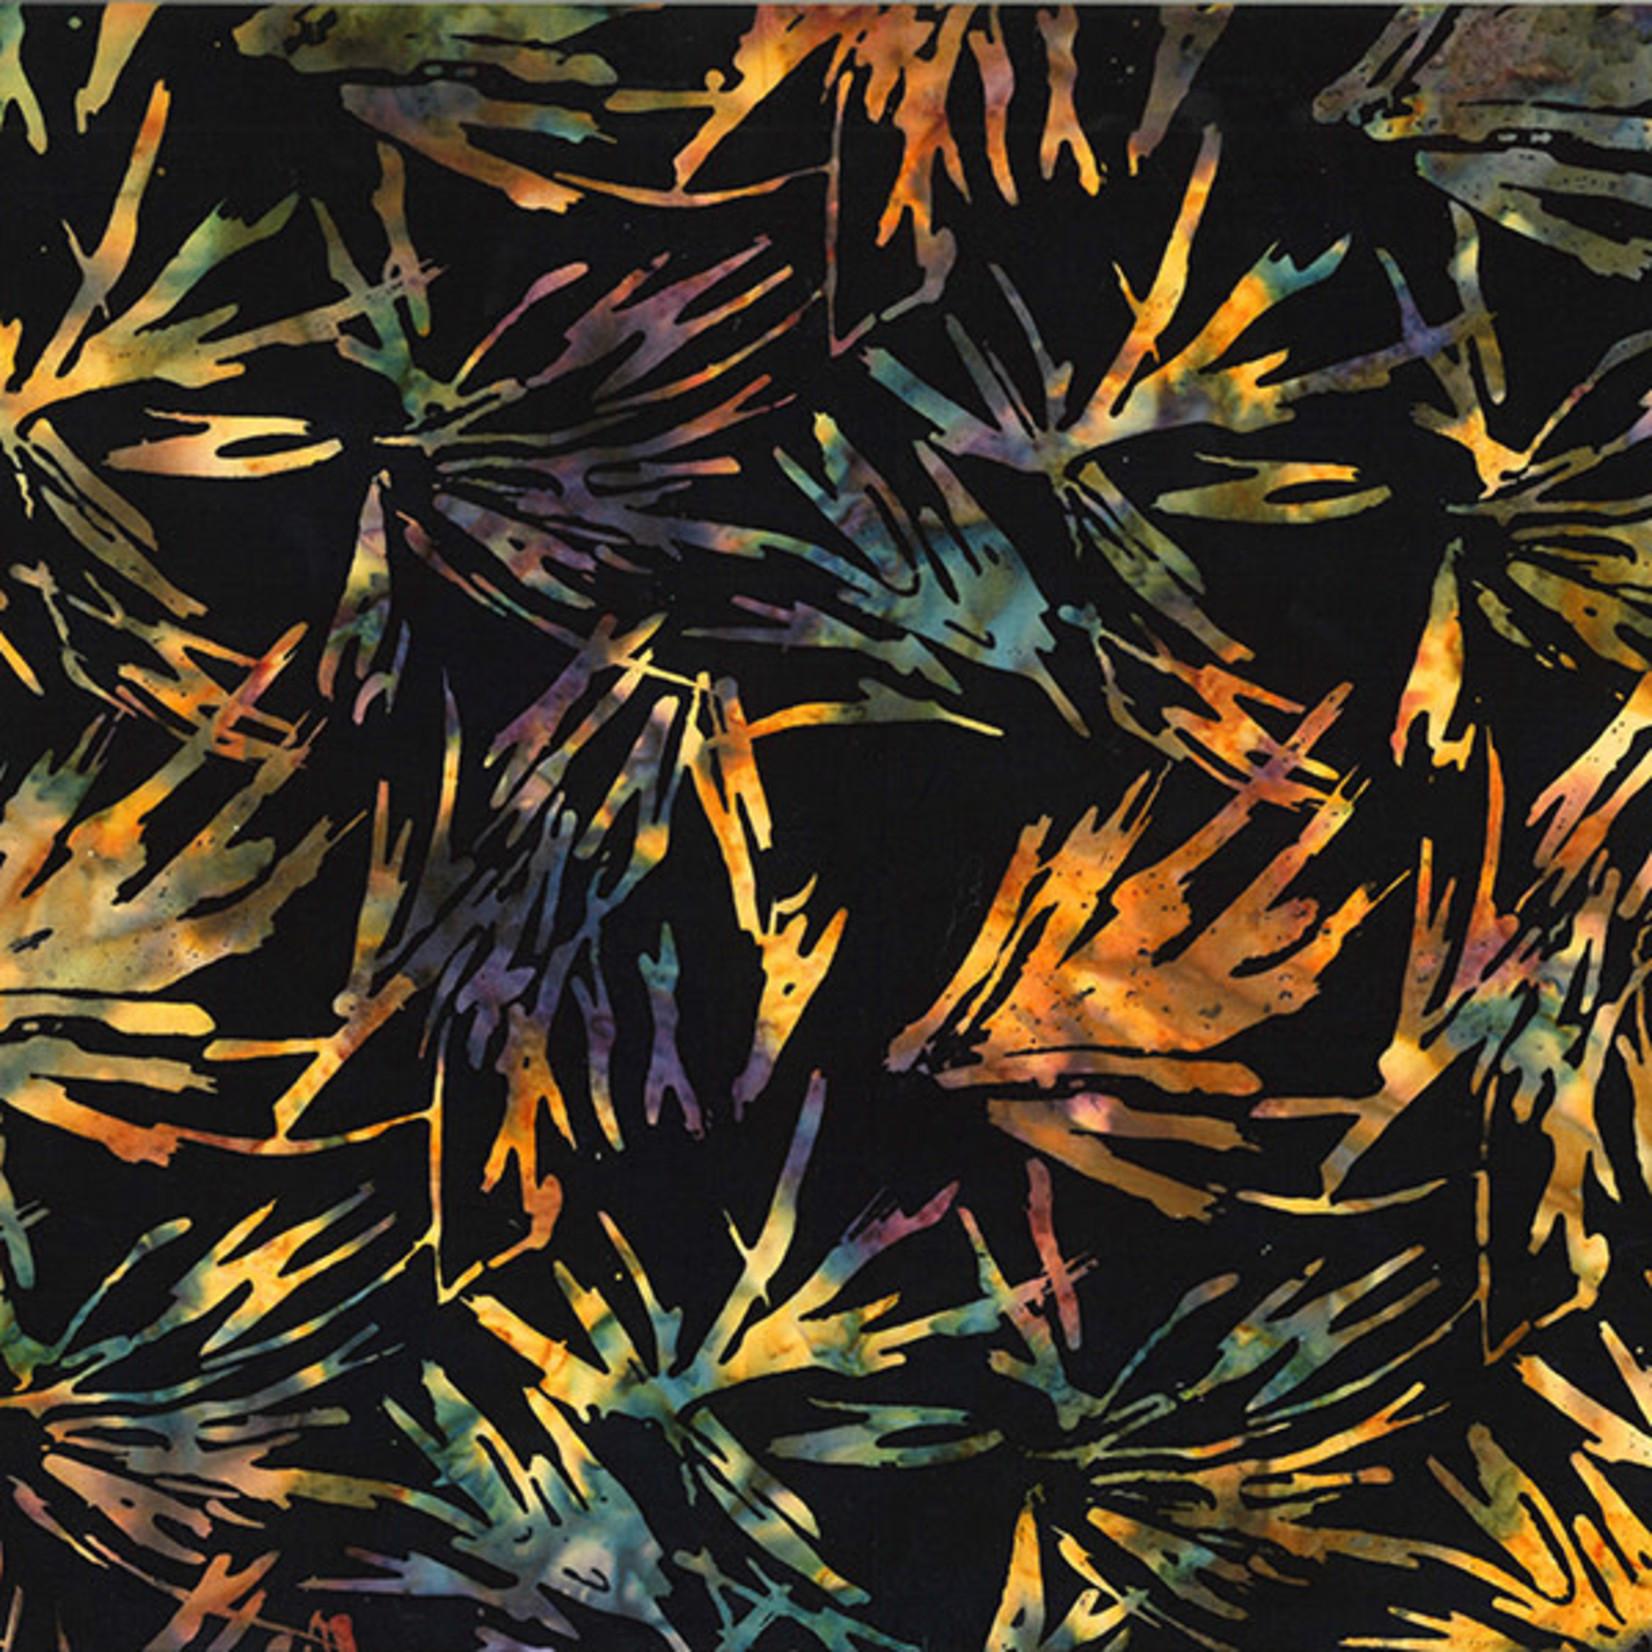 Hoffman Fabrics Bali Batik Abstract Leaves - Black Autumn